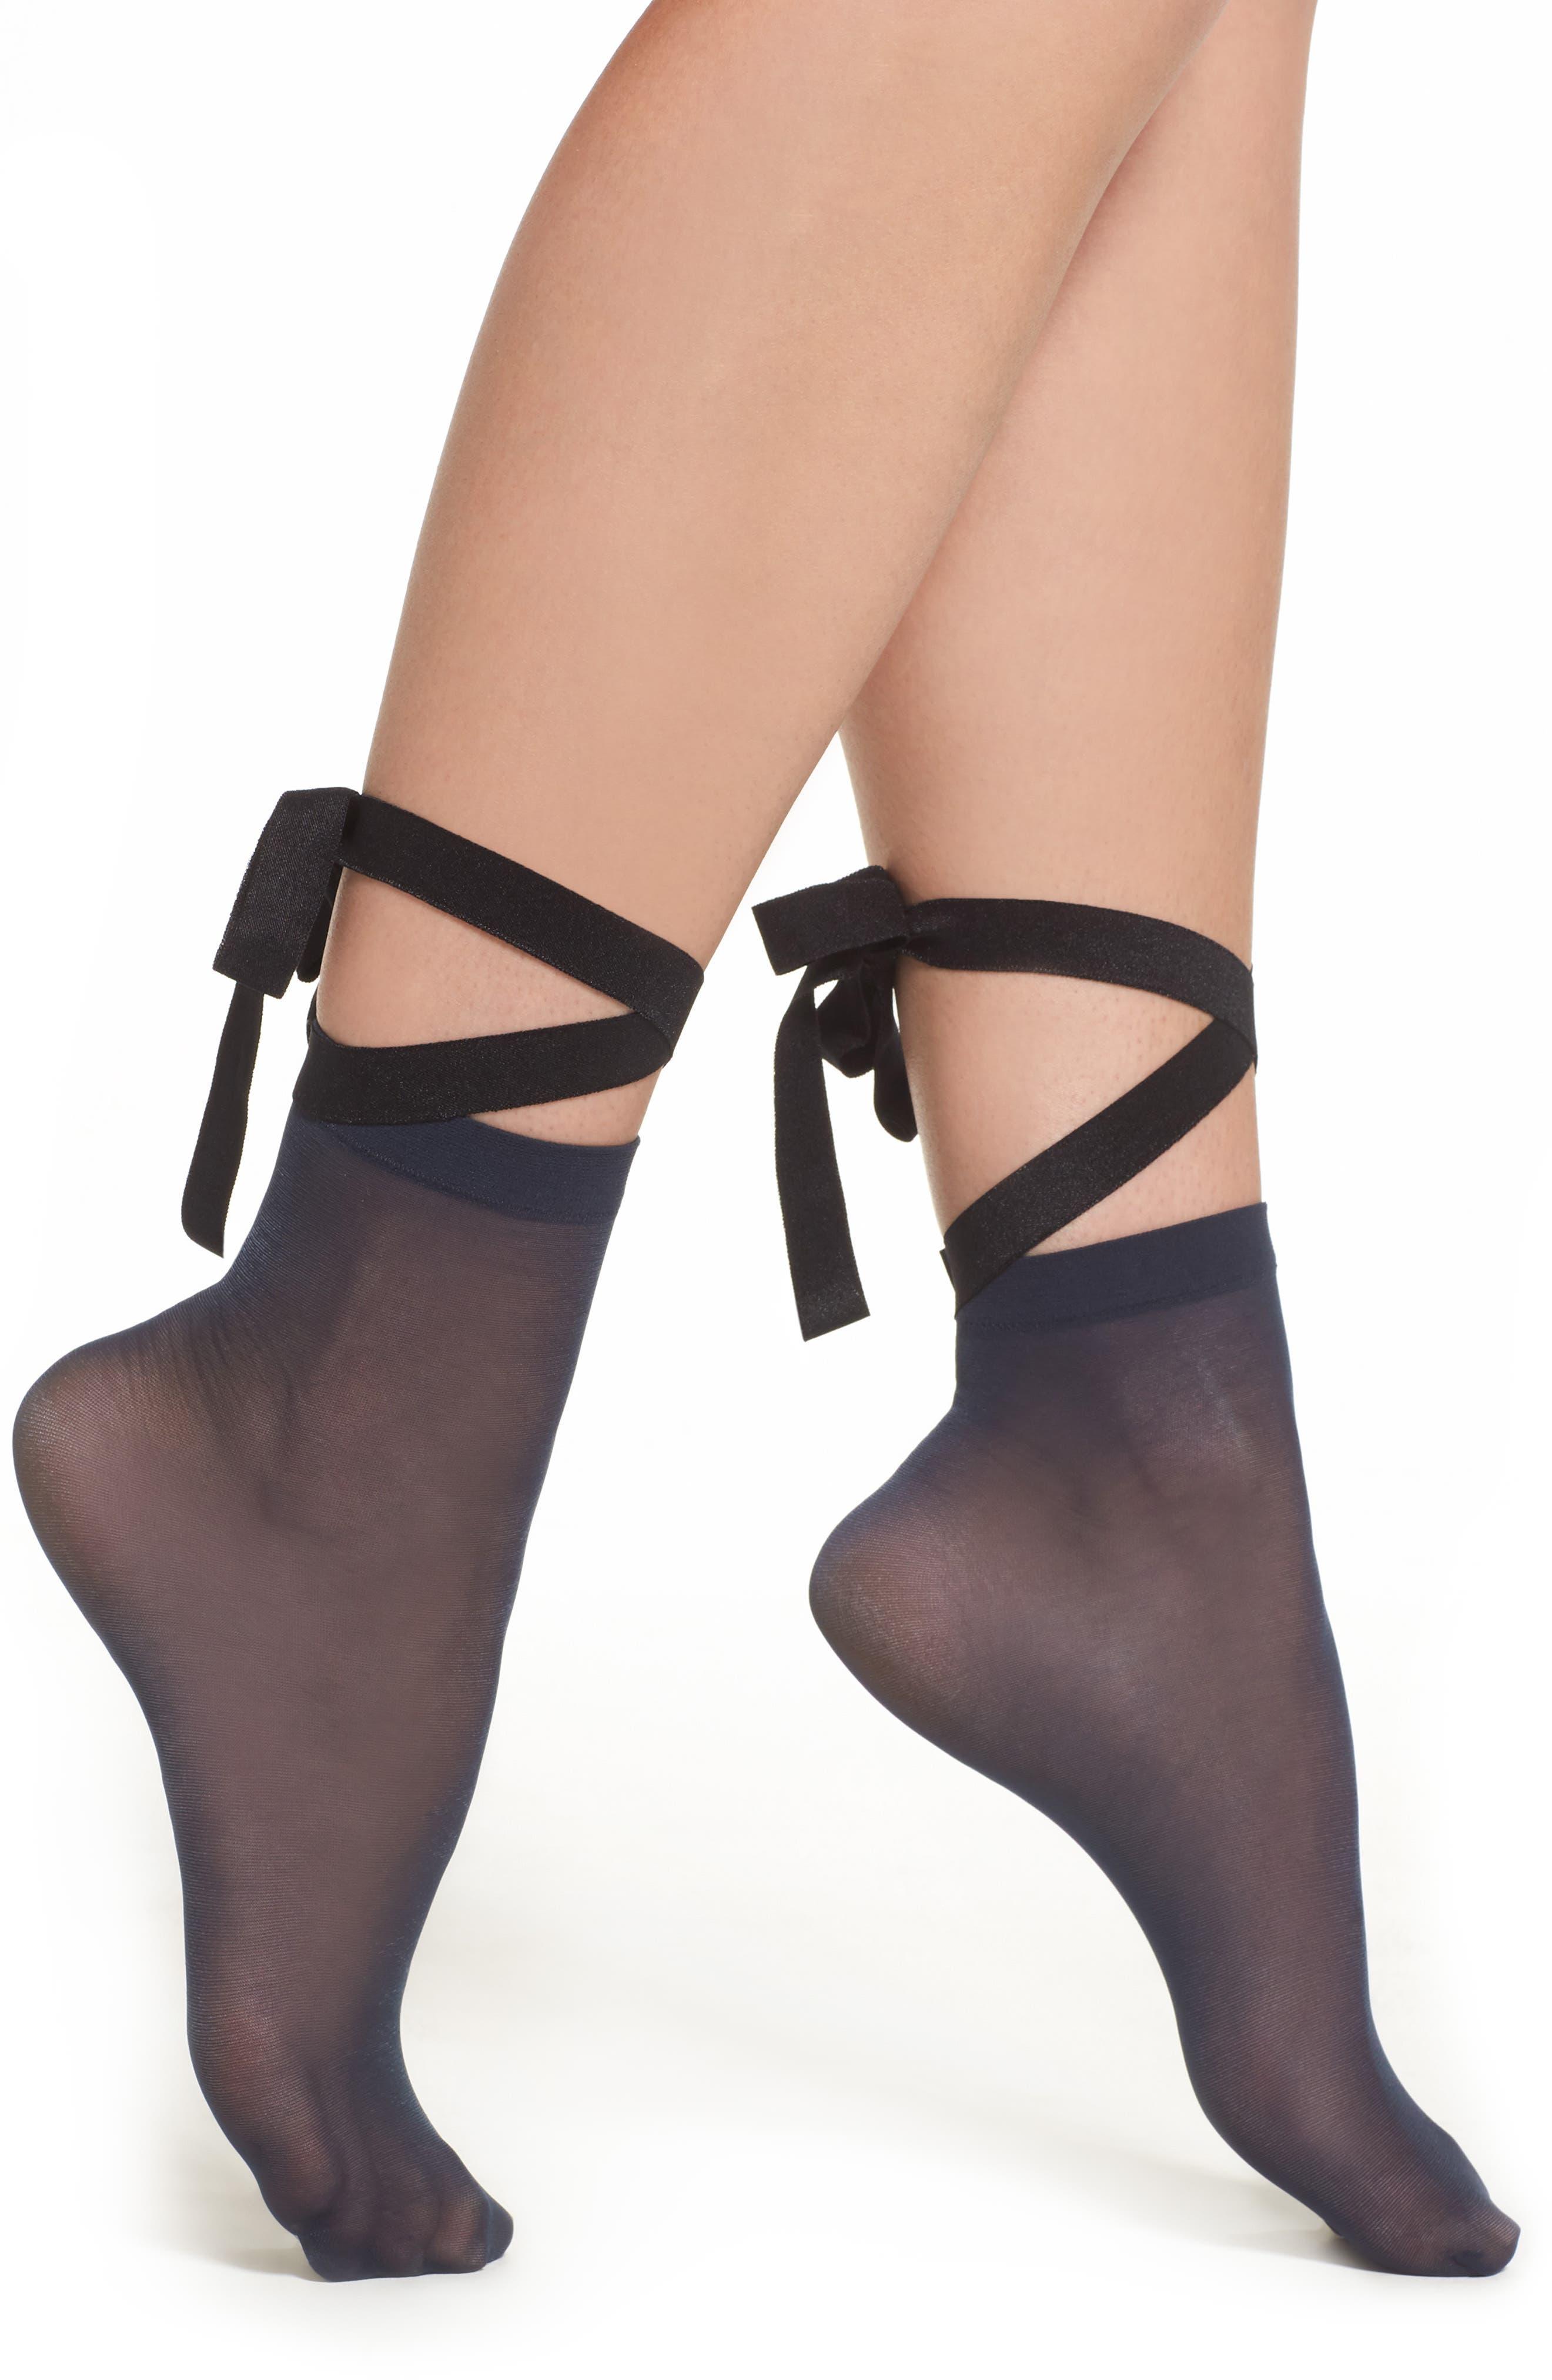 Patrizia Lace-Up Socks,                         Main,                         color, Dark Blue